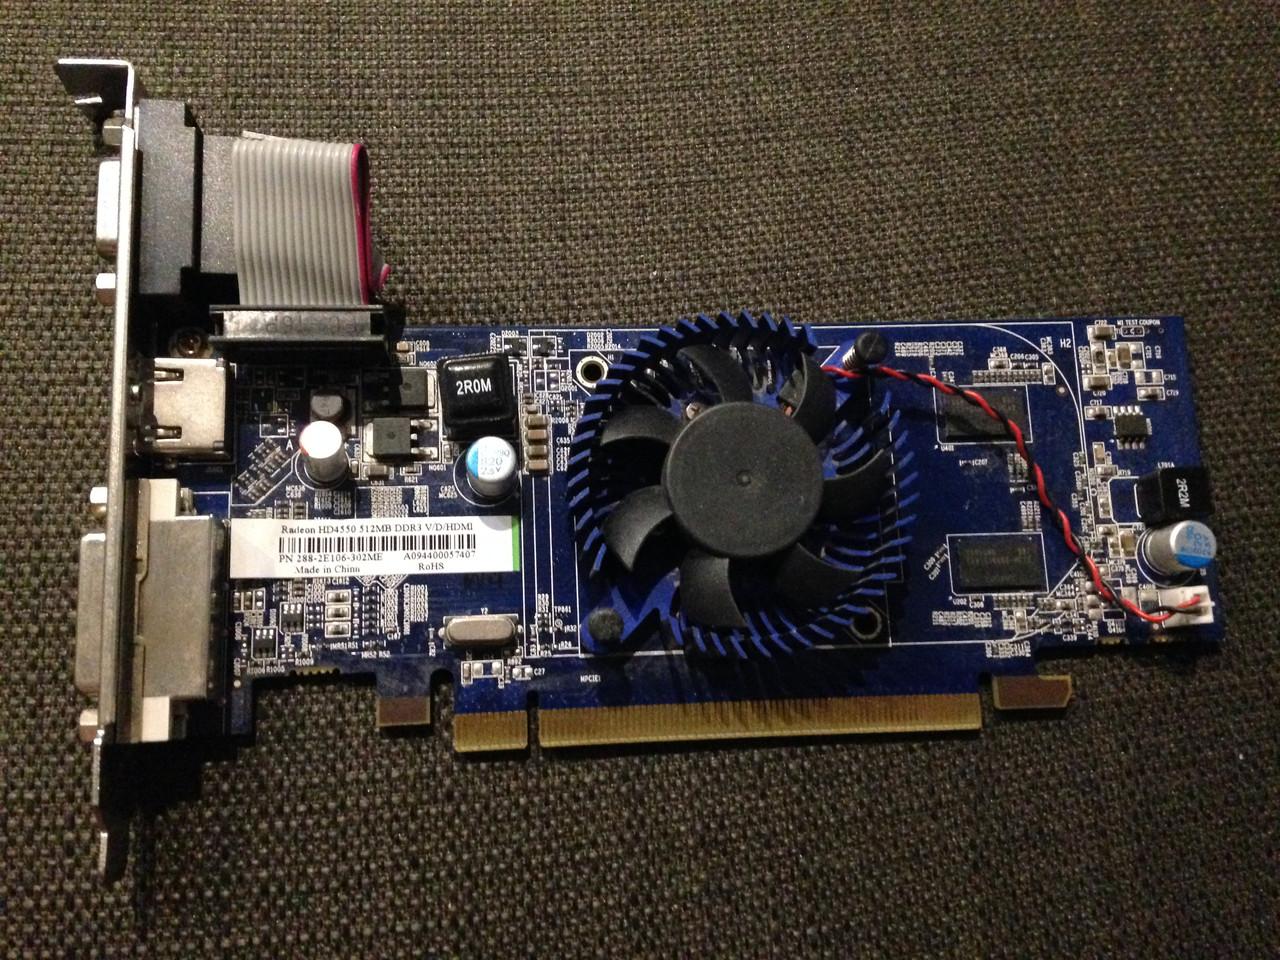 ВИДЕОКАРТА Pci-E RADEON 4550 c HDMI на 512 MB ГАРАНТИЕЙ ( видеоадаптер 4550 512mb  )